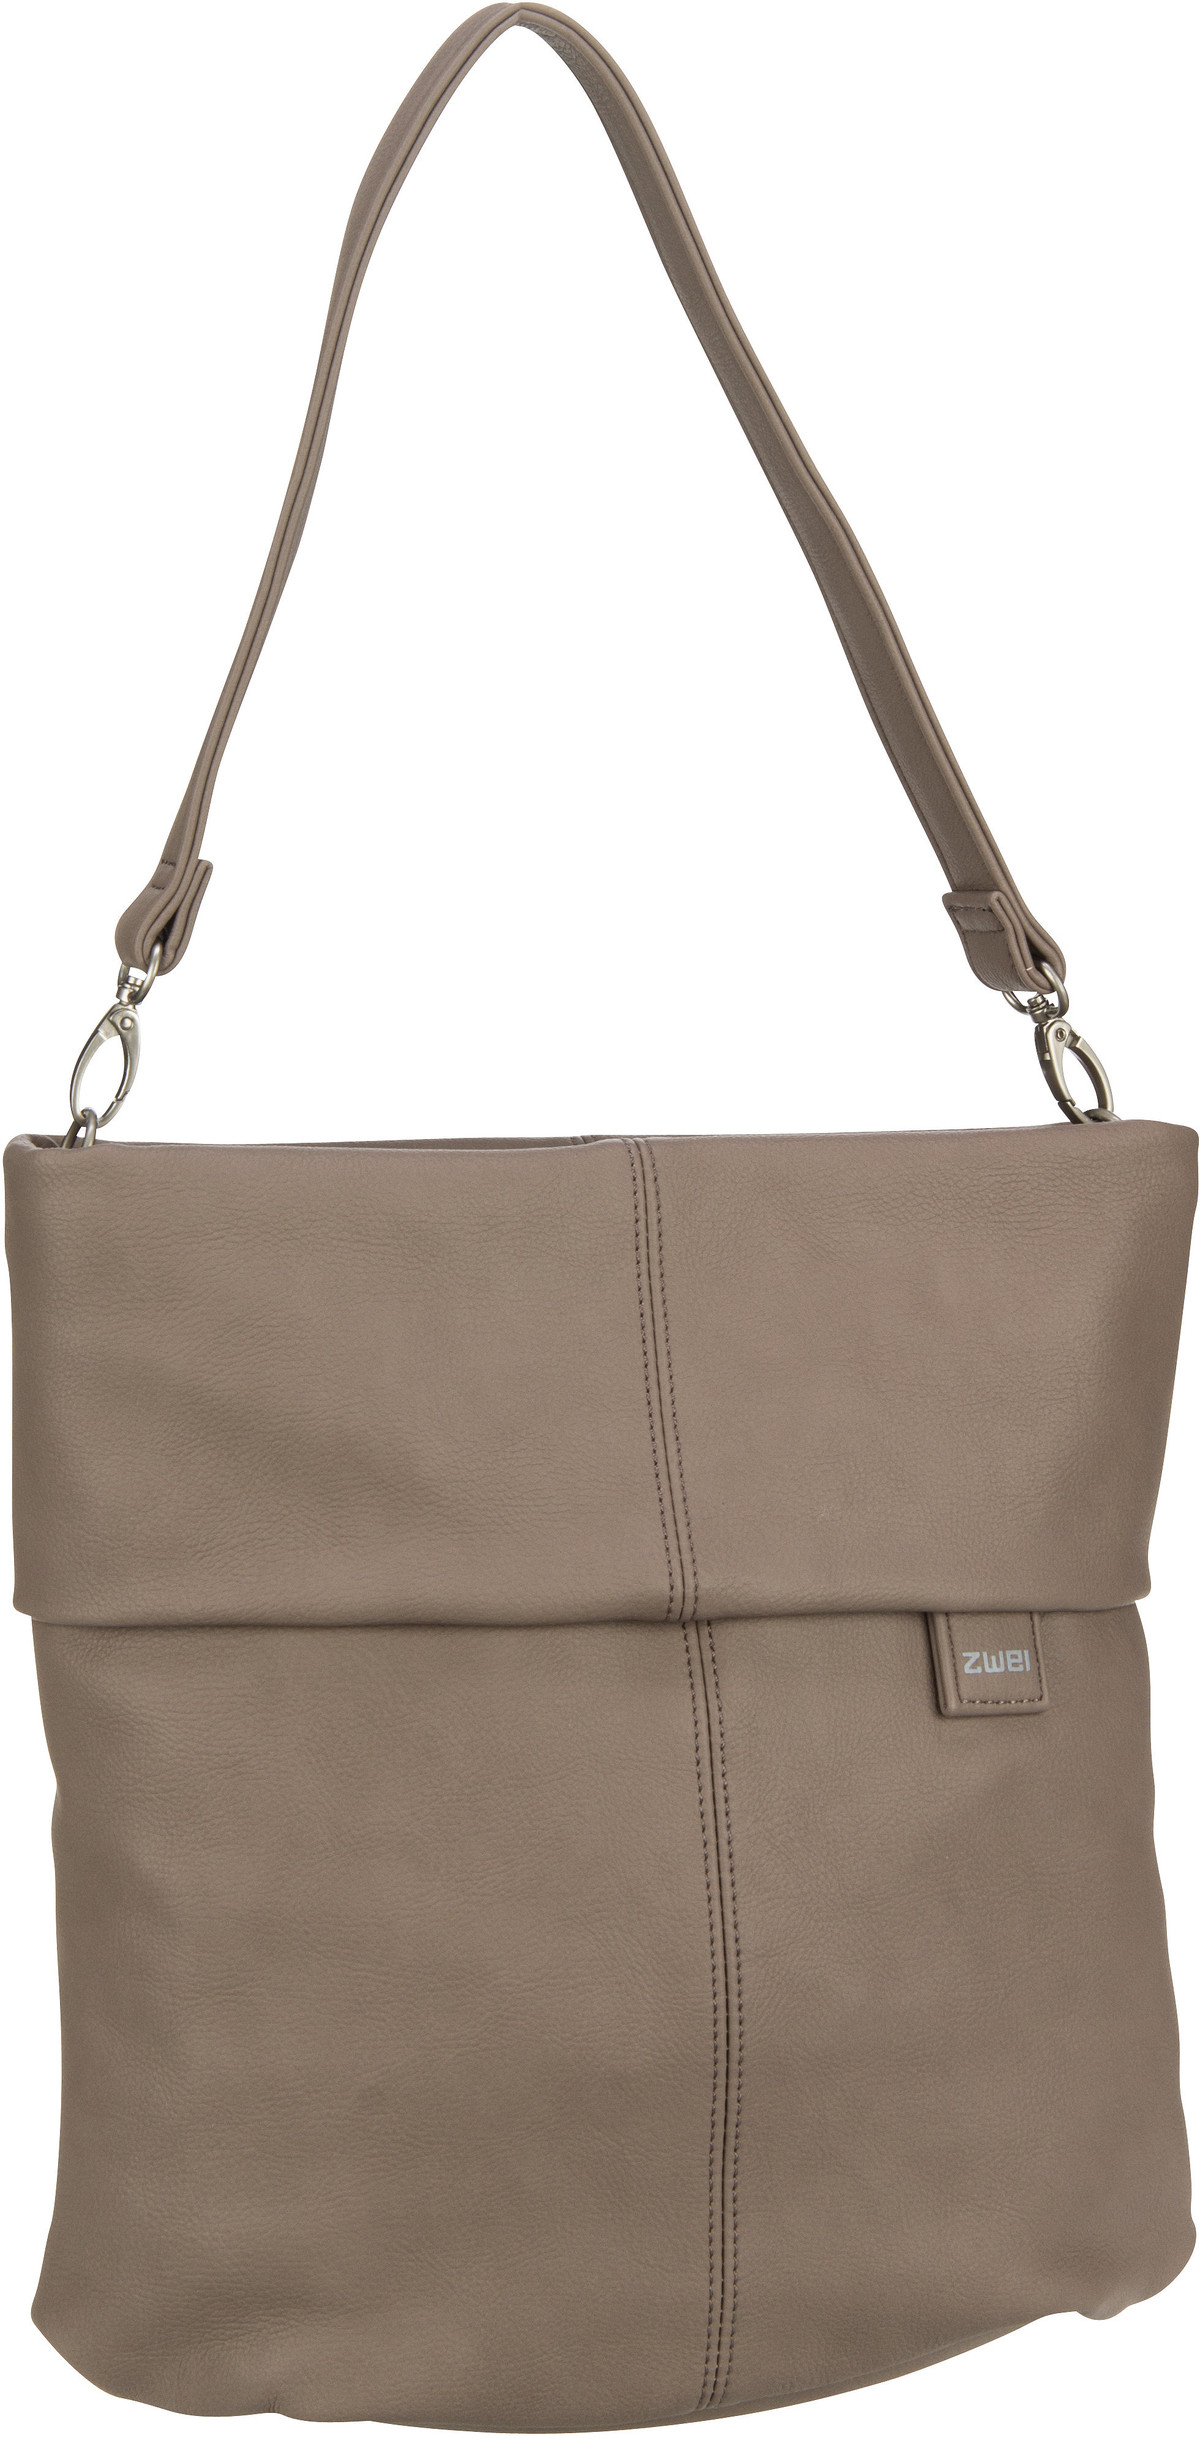 Handtasche Mademoiselle M12 Nubuk/Taupe (7 Liter)